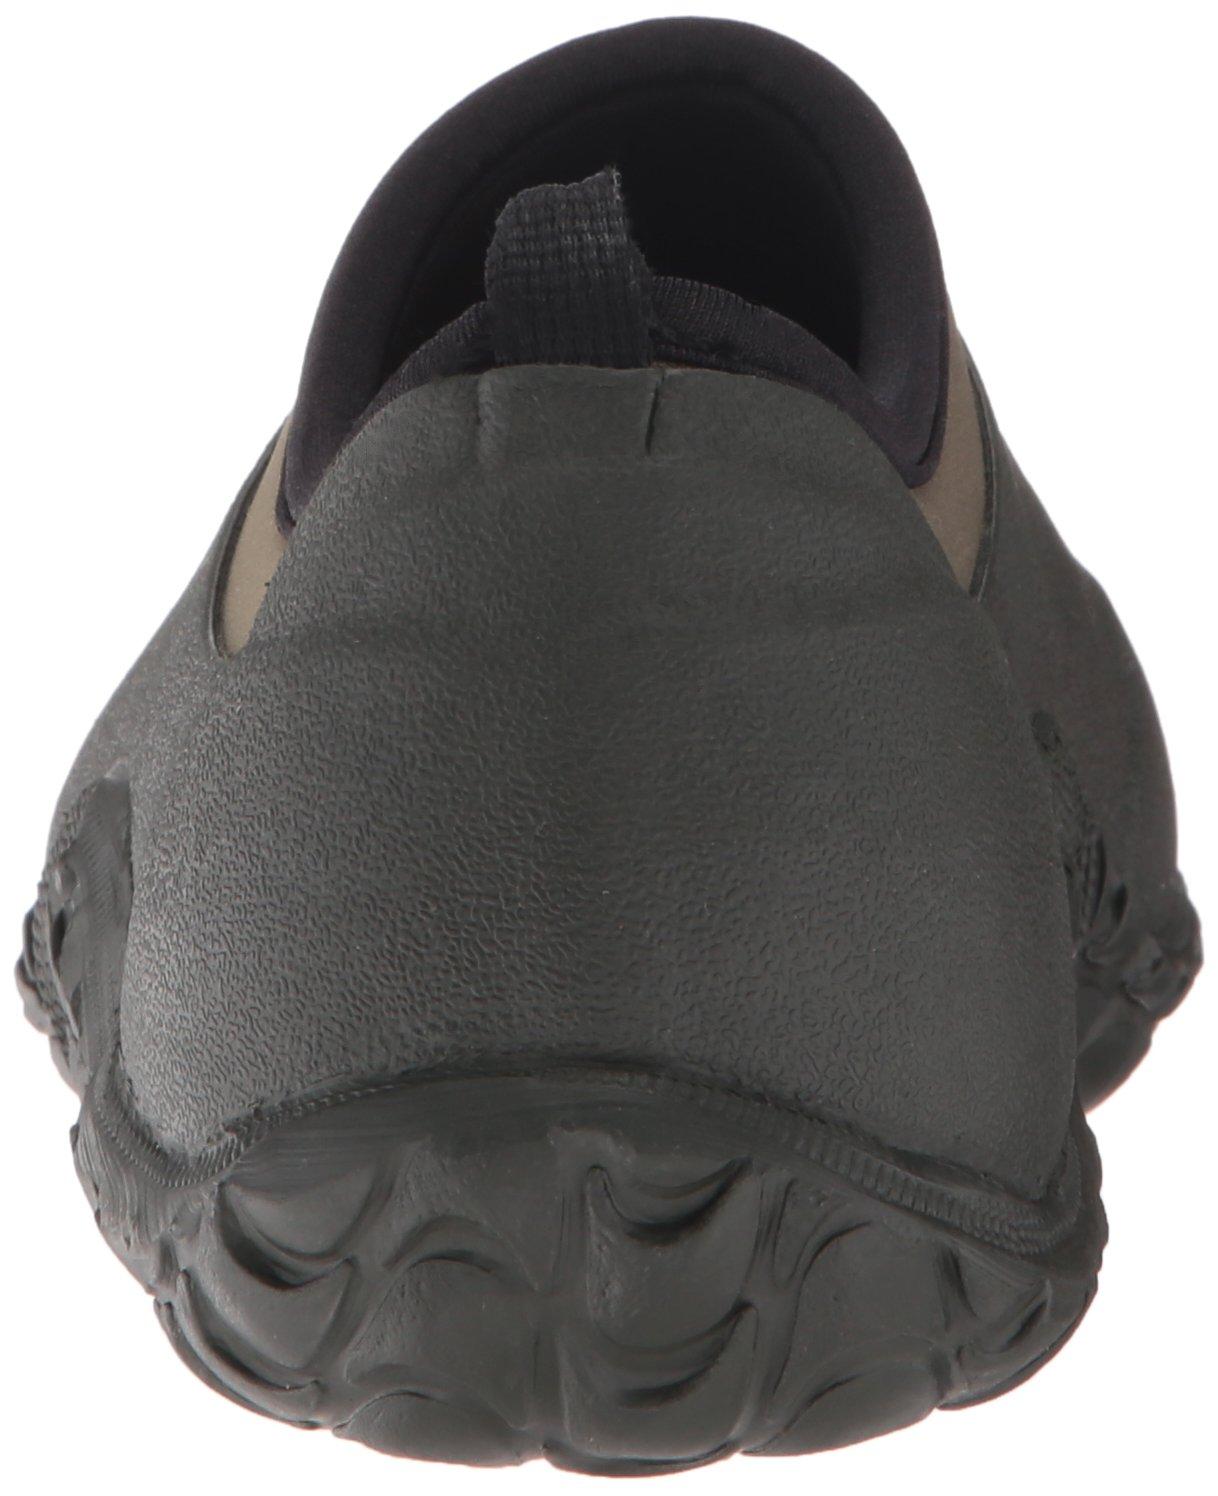 The Original MuckBoots Unisex Edgewater Camp Shoe,Moss ,11 M US Mens/12 M US Womens by Muck Boot (Image #2)